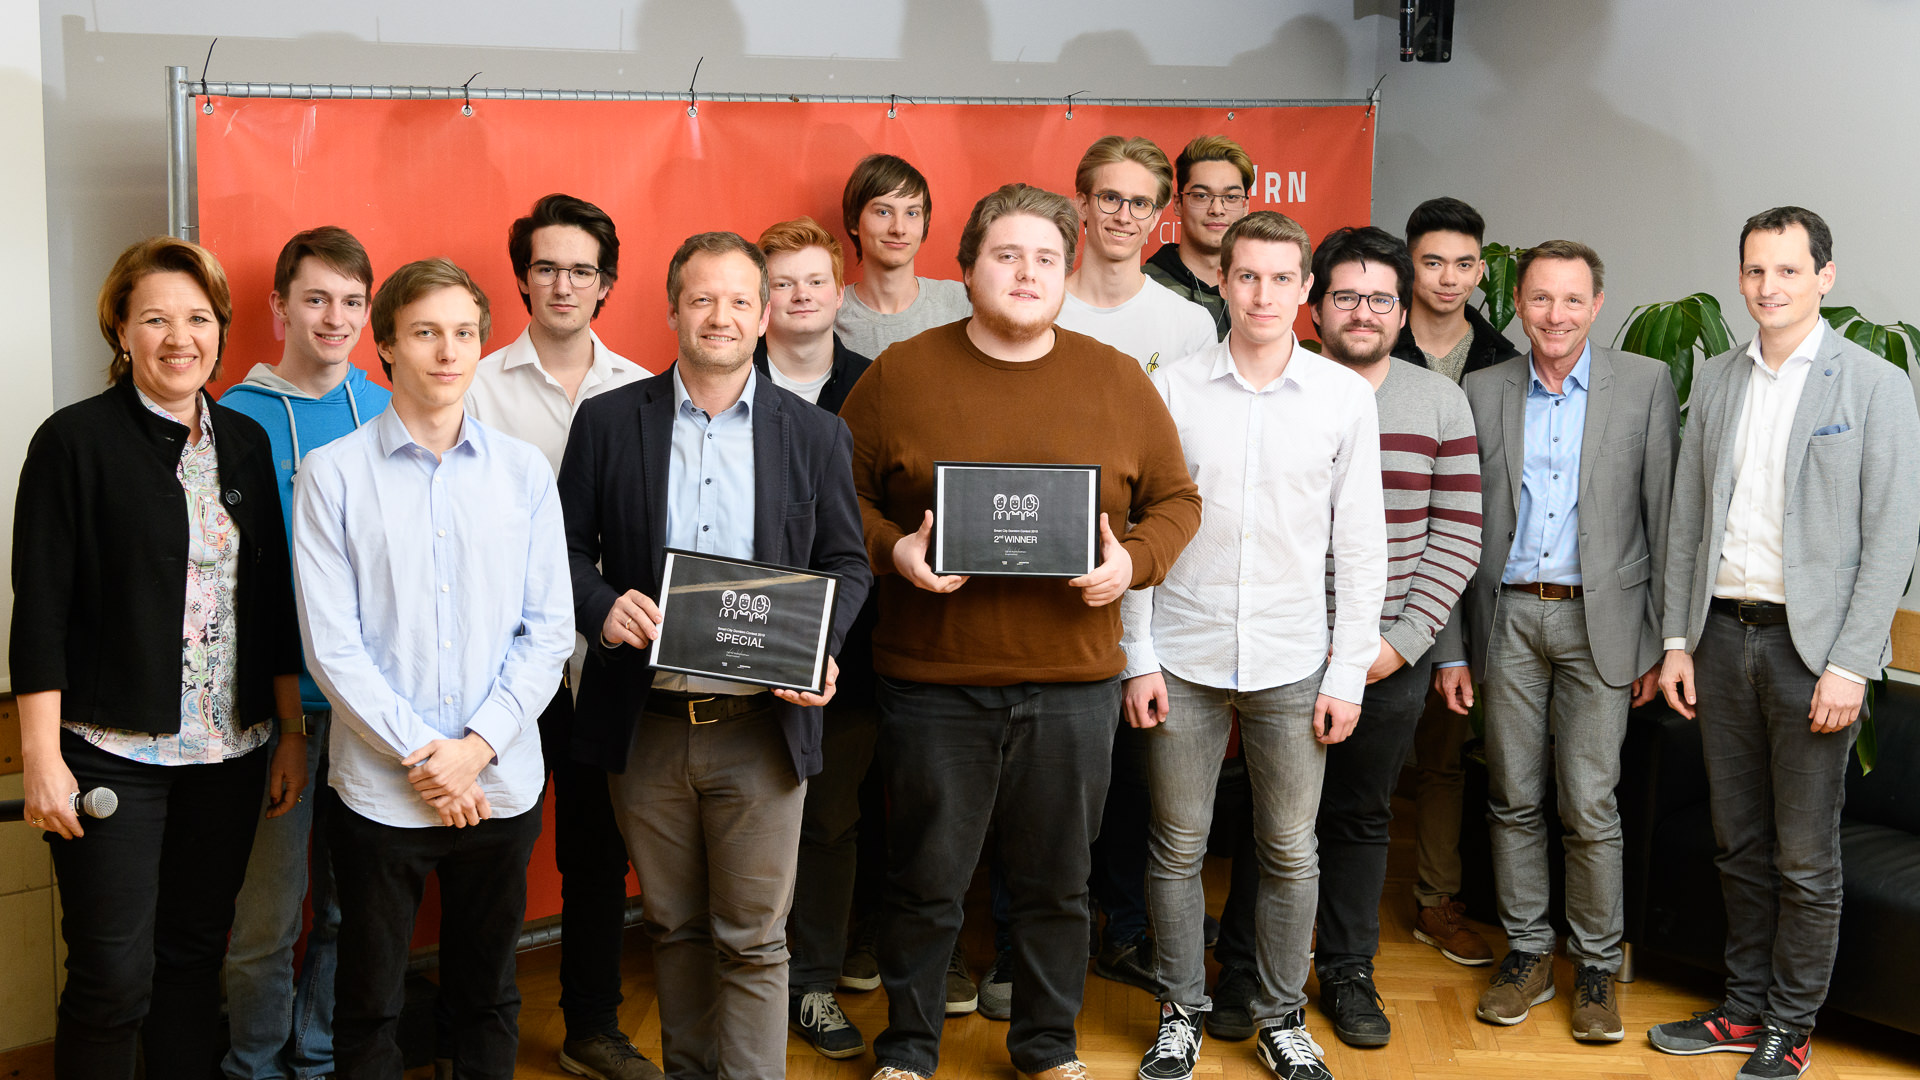 Glückwunsch allen Smart City Dornbirn Preisträgern